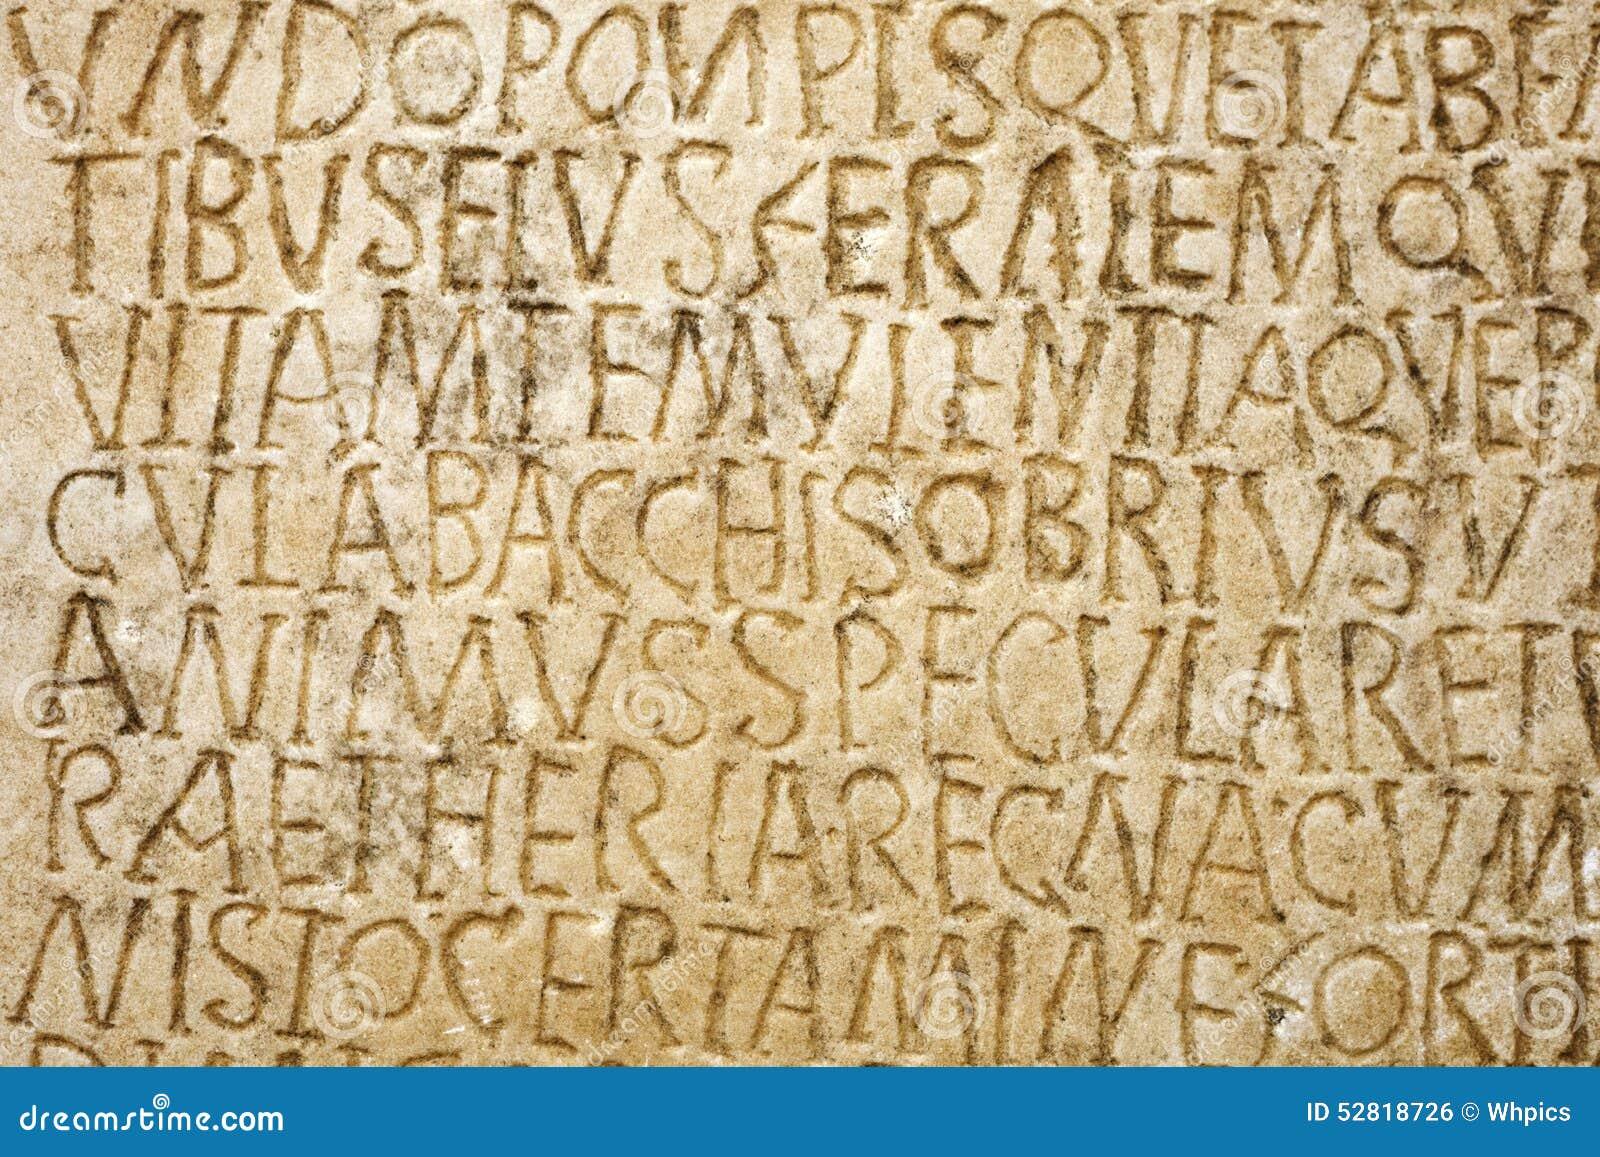 Roman writing stock photo. Image of latin, aged, message ...